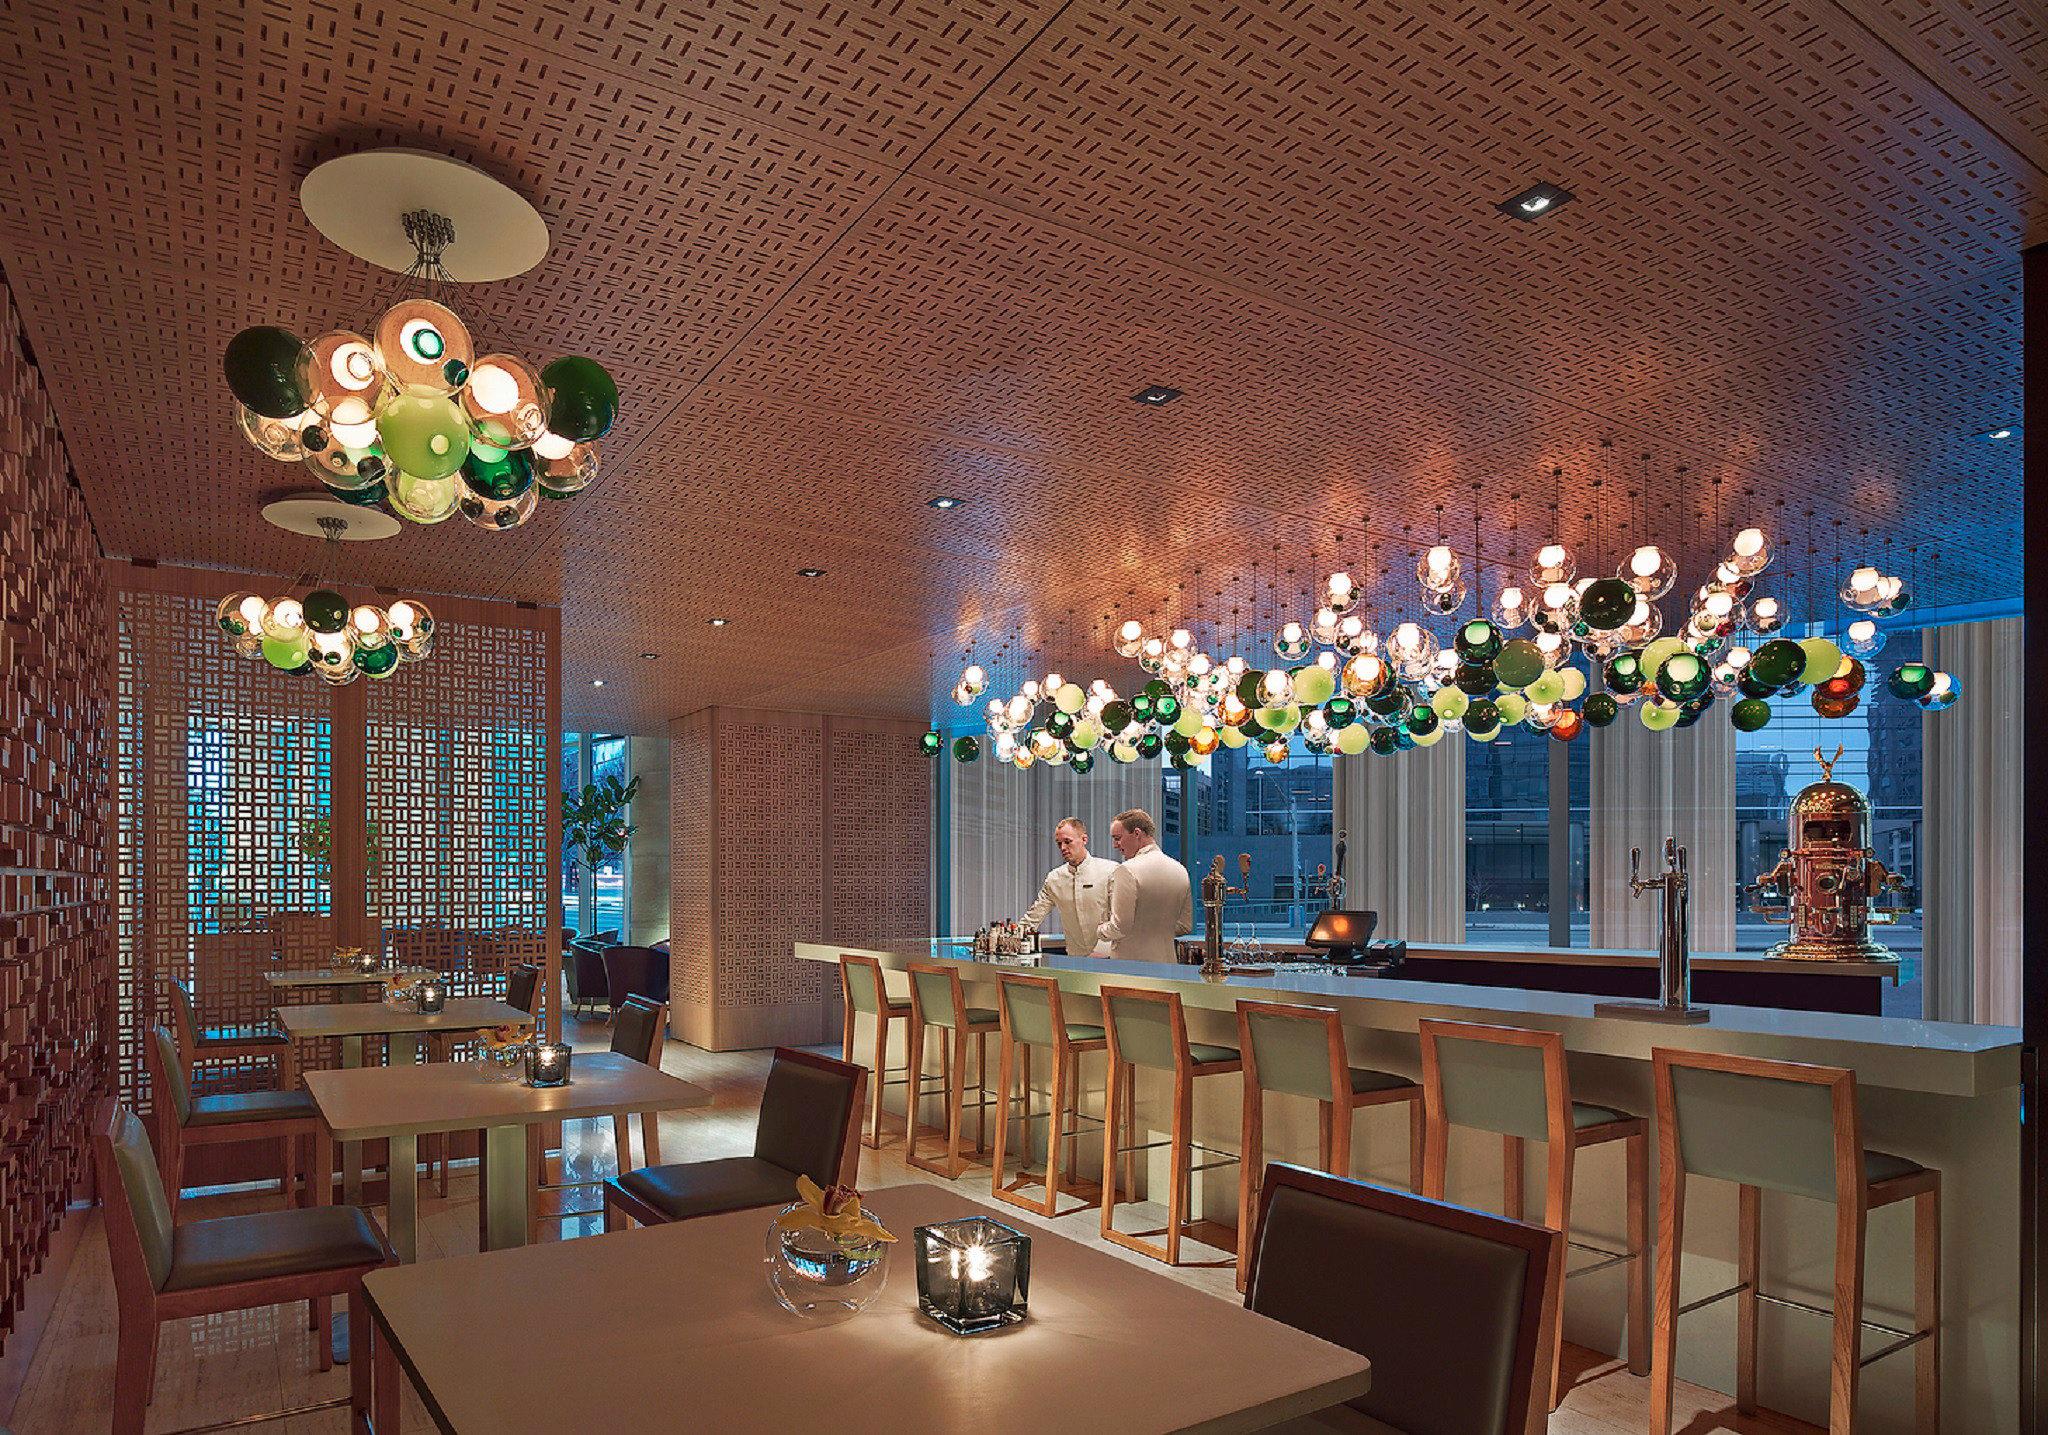 Dining Drink Eat Hip Modern Scenic views Lobby restaurant lighting